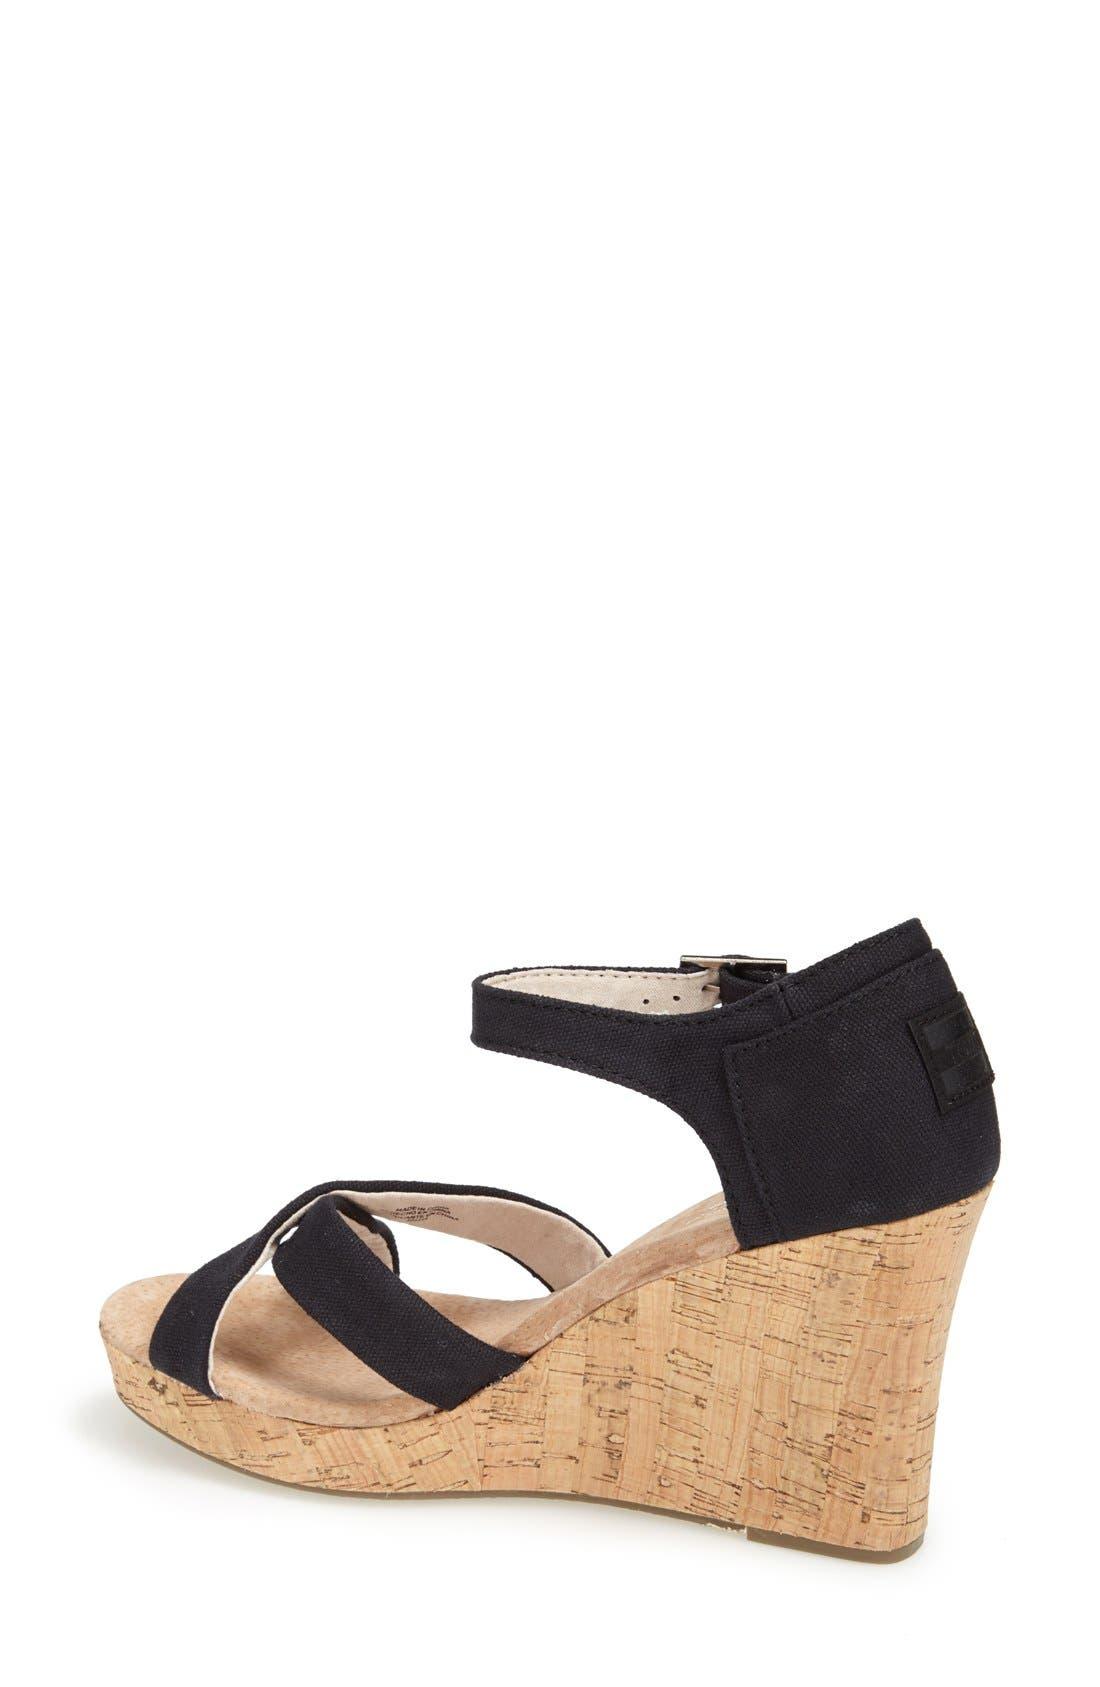 Alternate Image 2  - TOMS Canvas Ankle Strap Wedge Sandal (Women)